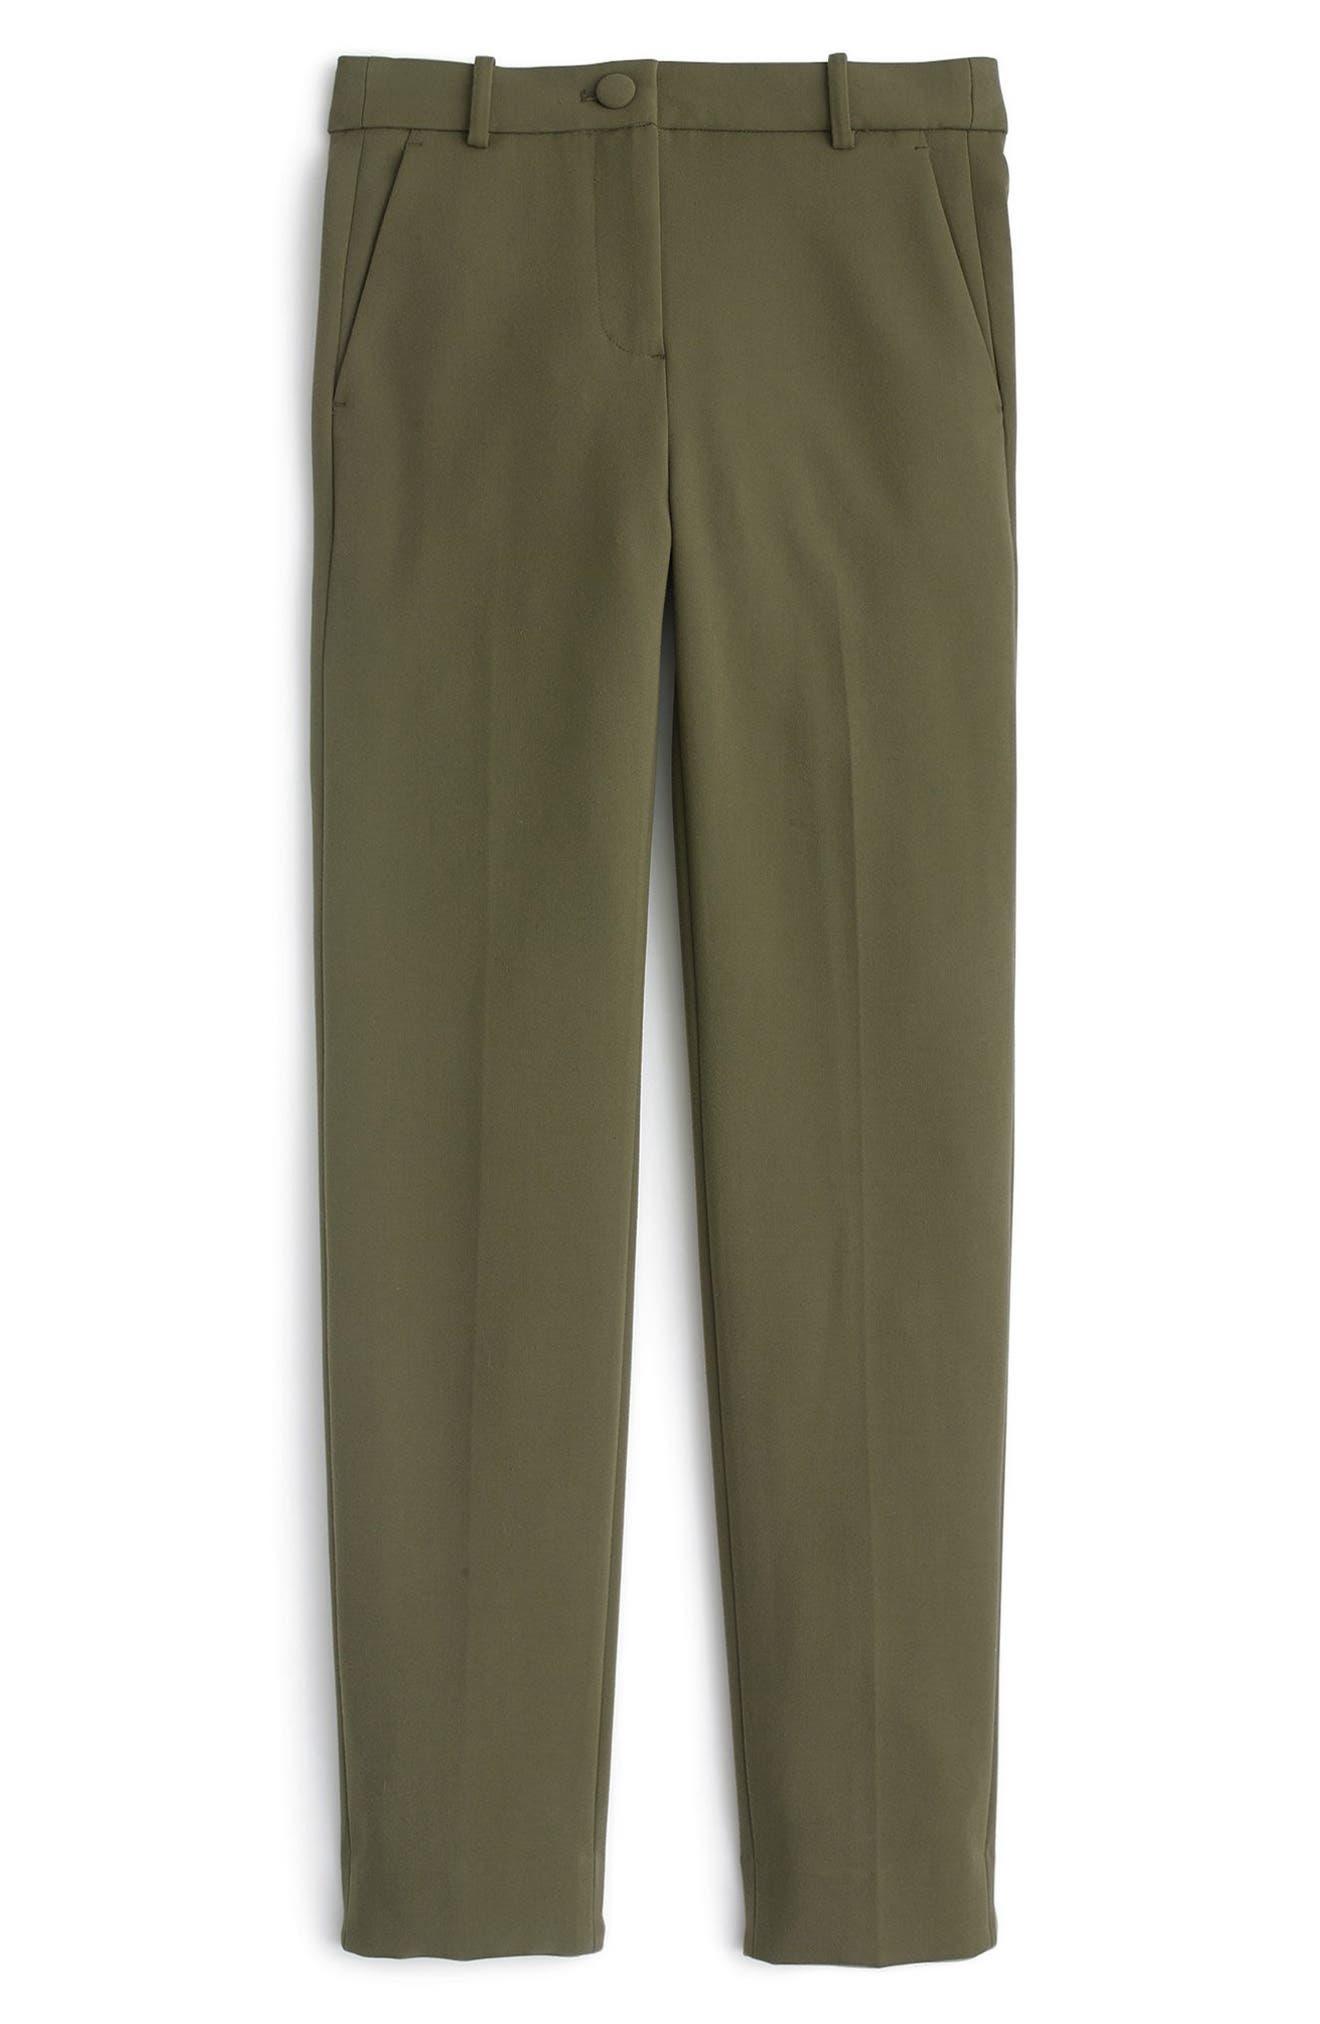 J.Crew Cameron Seasonless Stretch Pants (Regular & Petite)